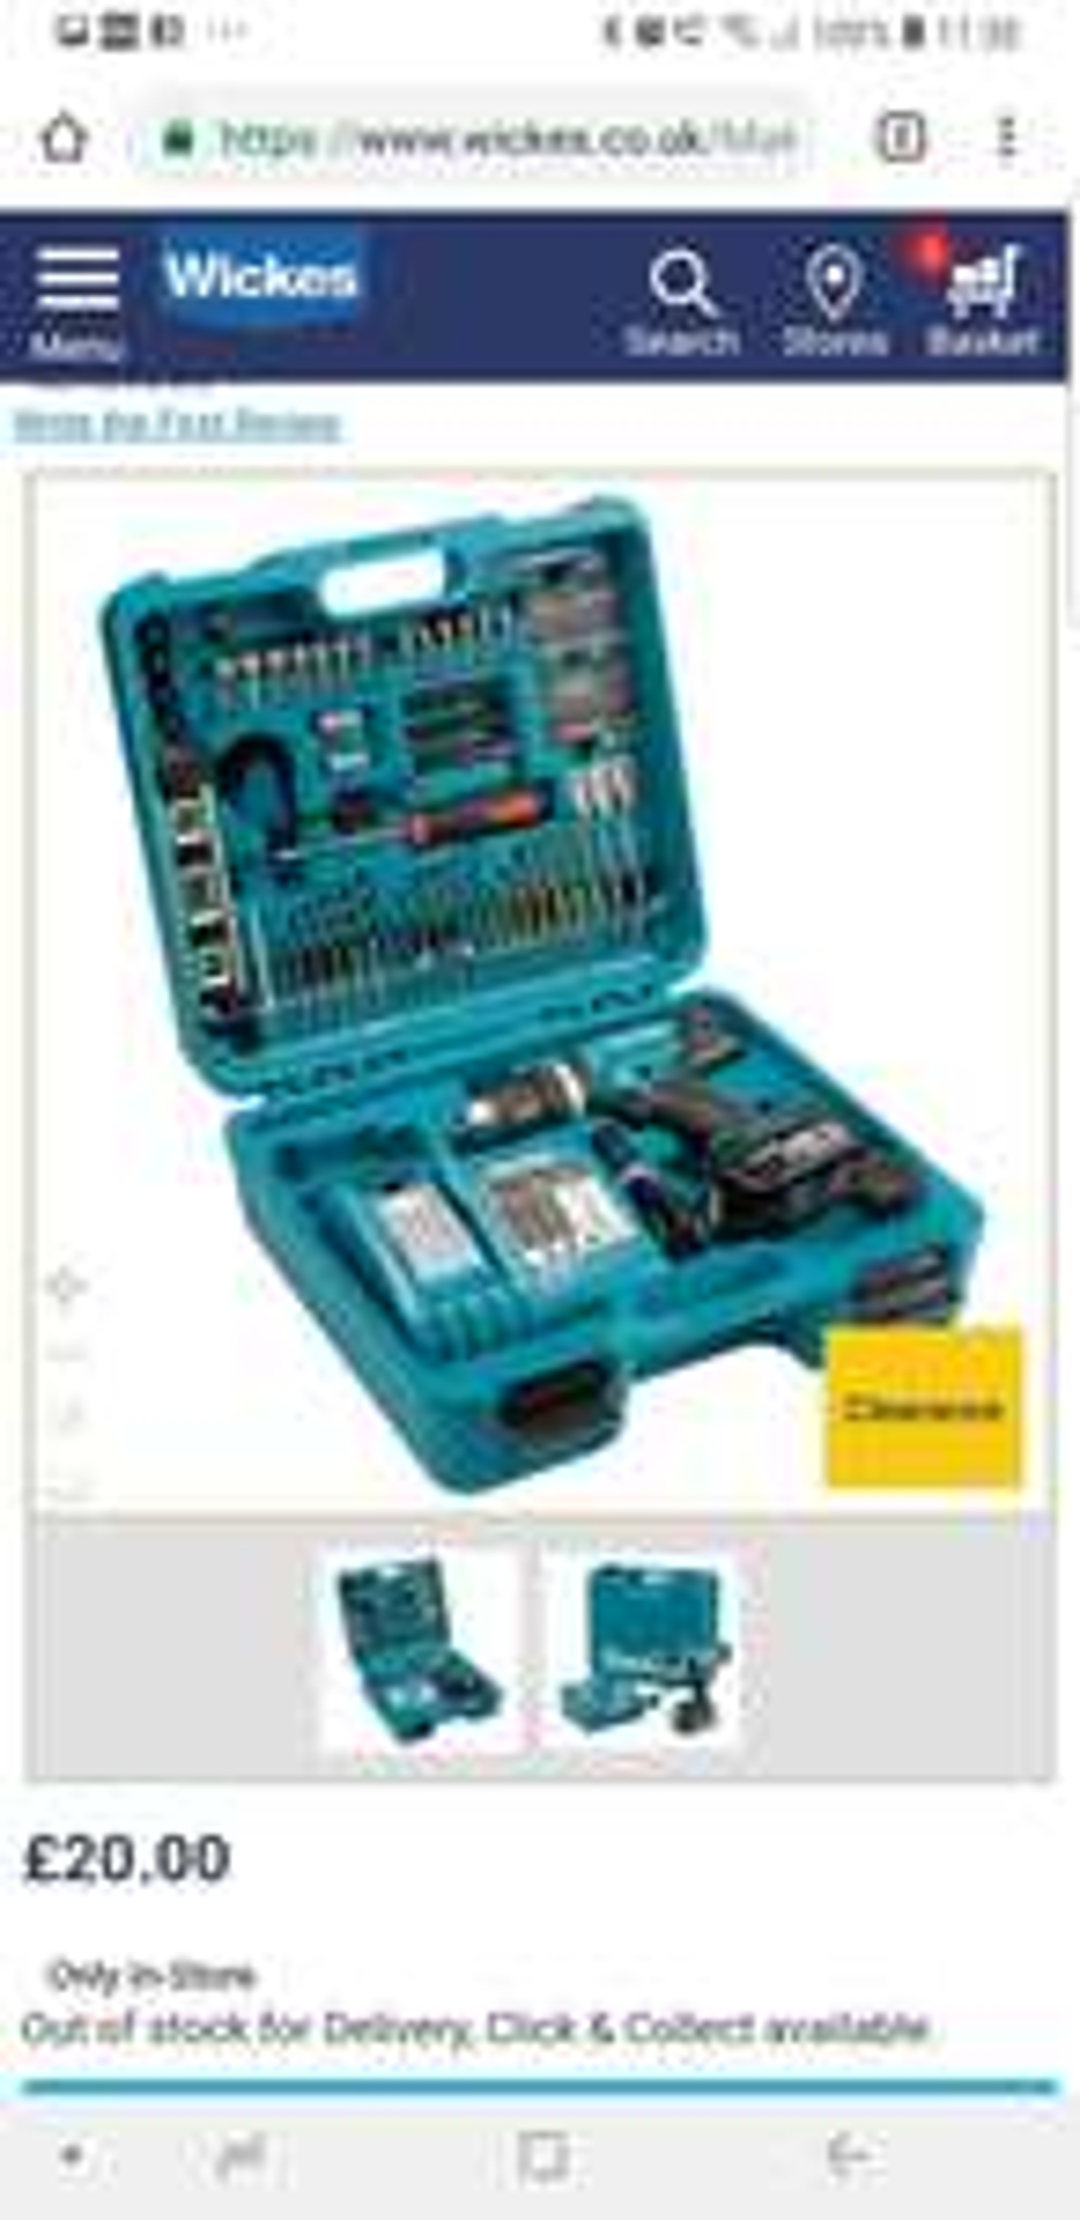 Makita DHP453RFTK 18V Li-ion Combi Drill with 101 Piece Accessory Kit - £20 @ Wickes